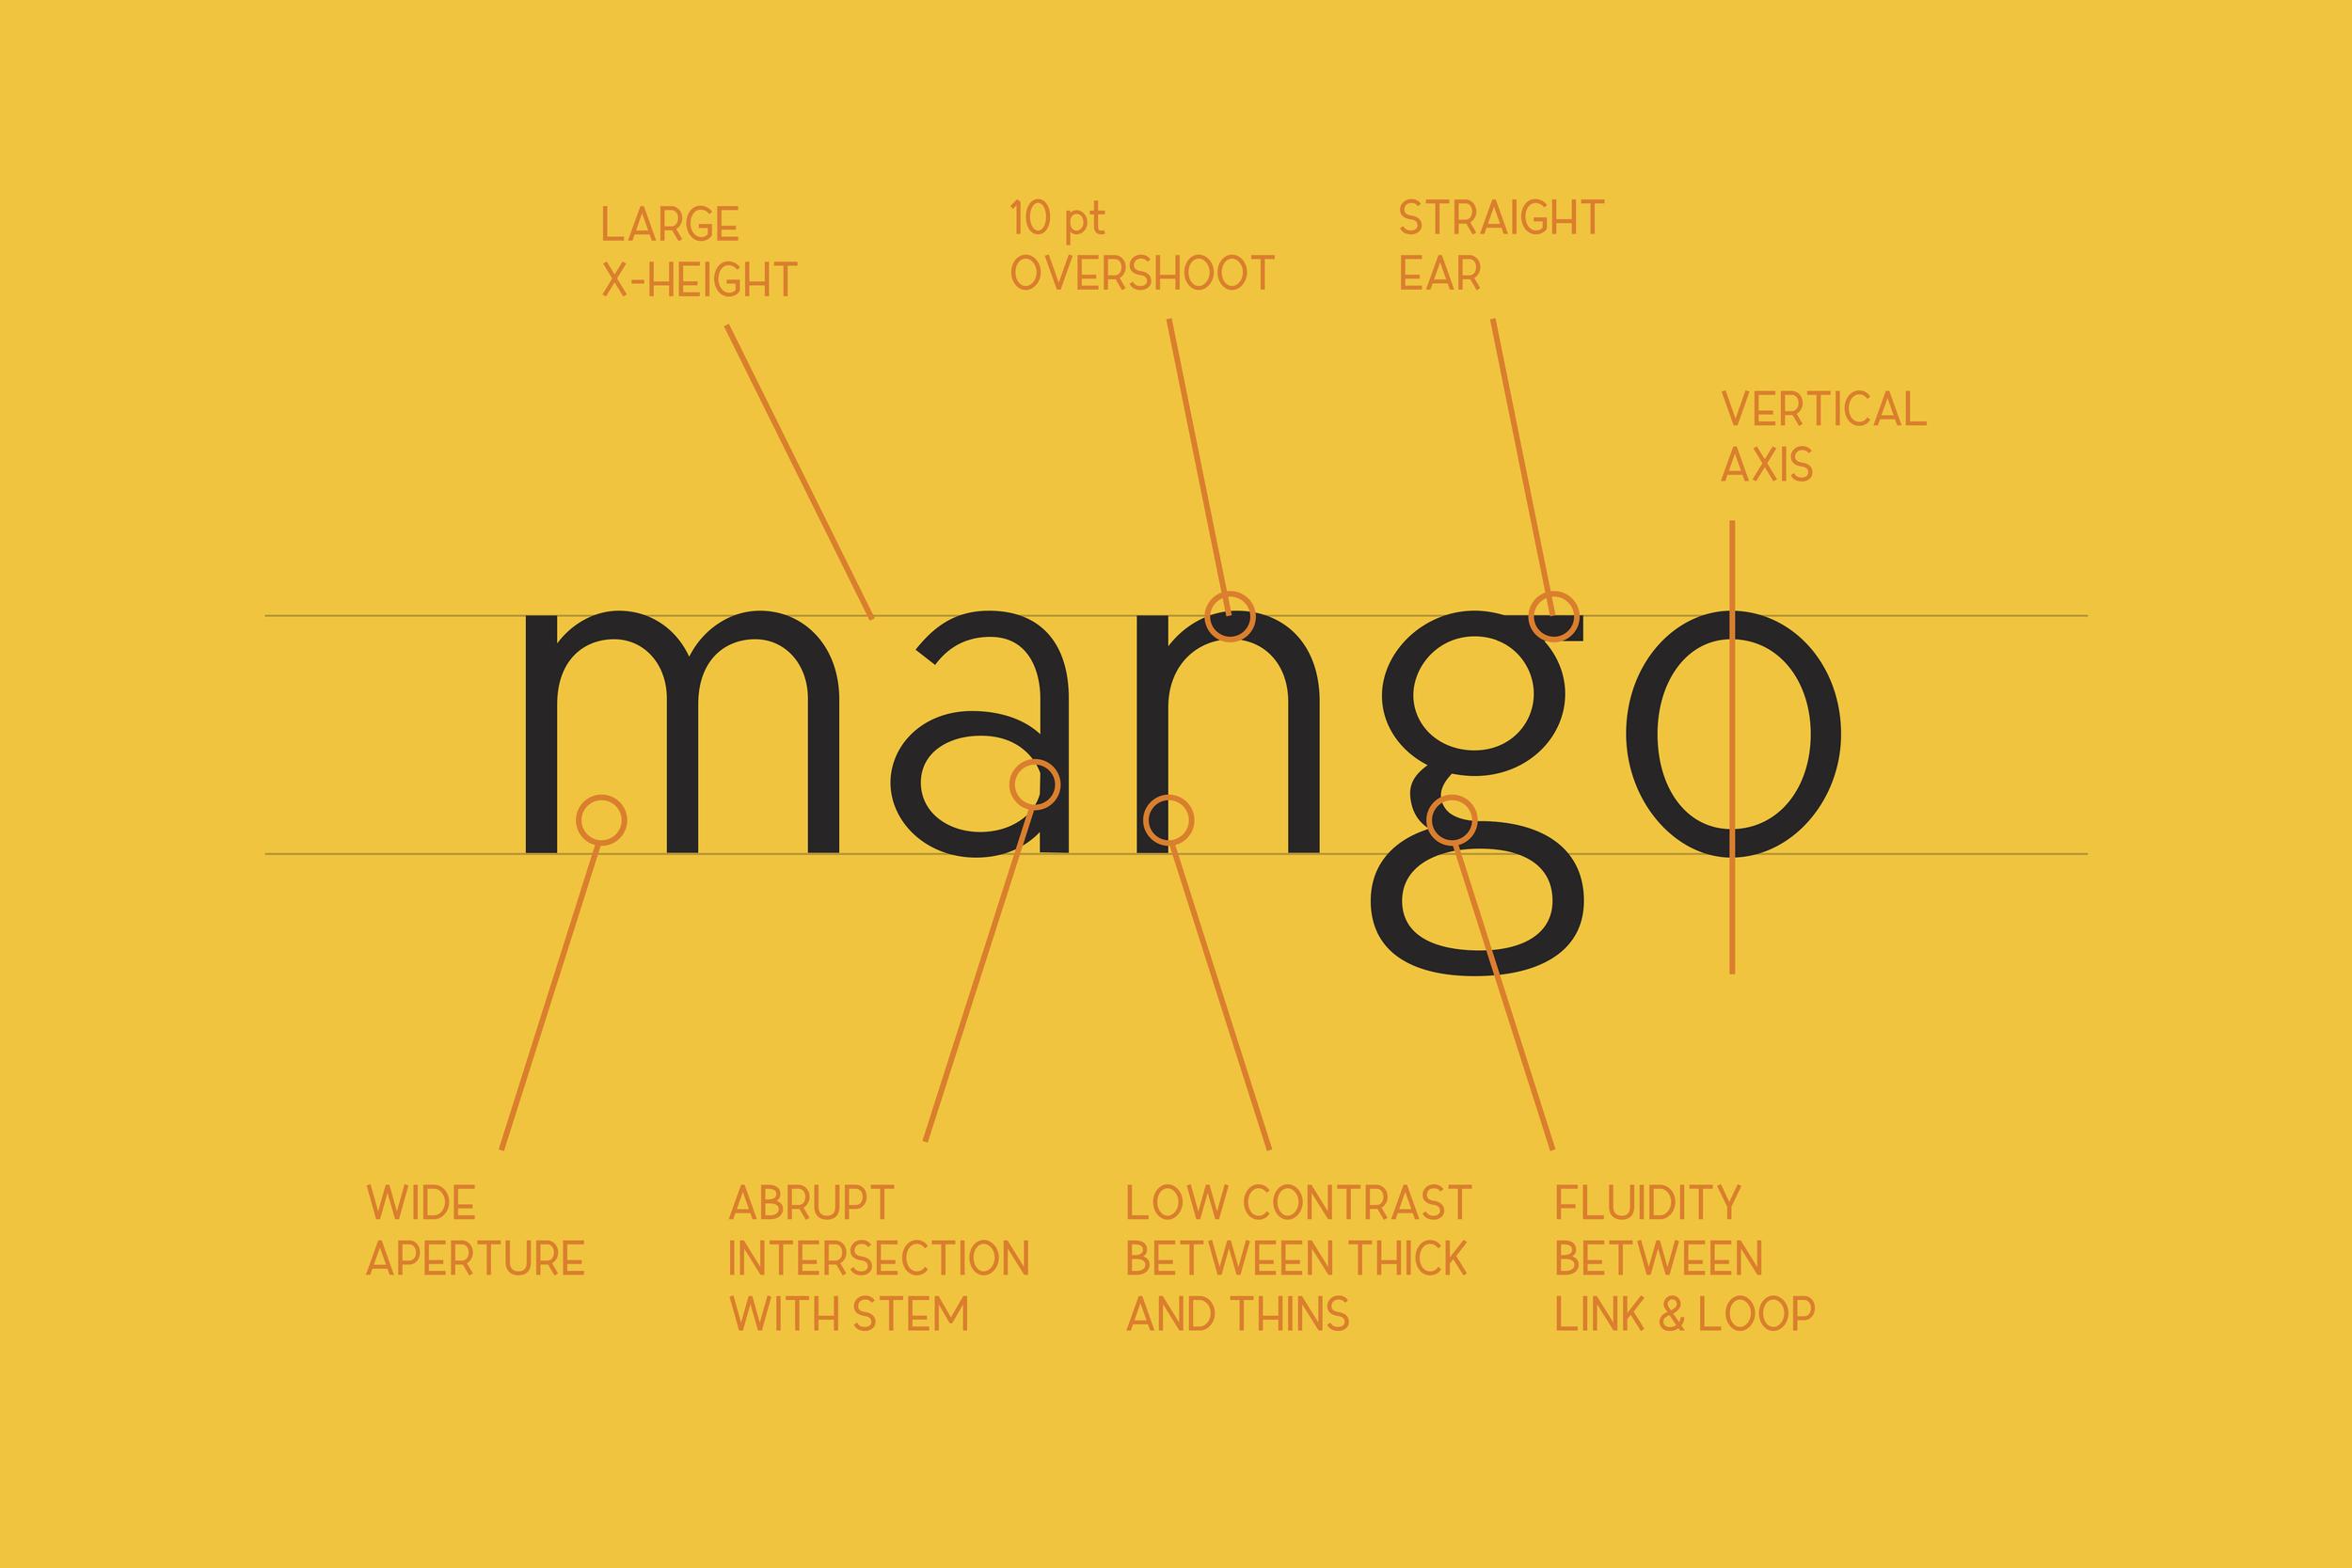 mango_zoom.jpg